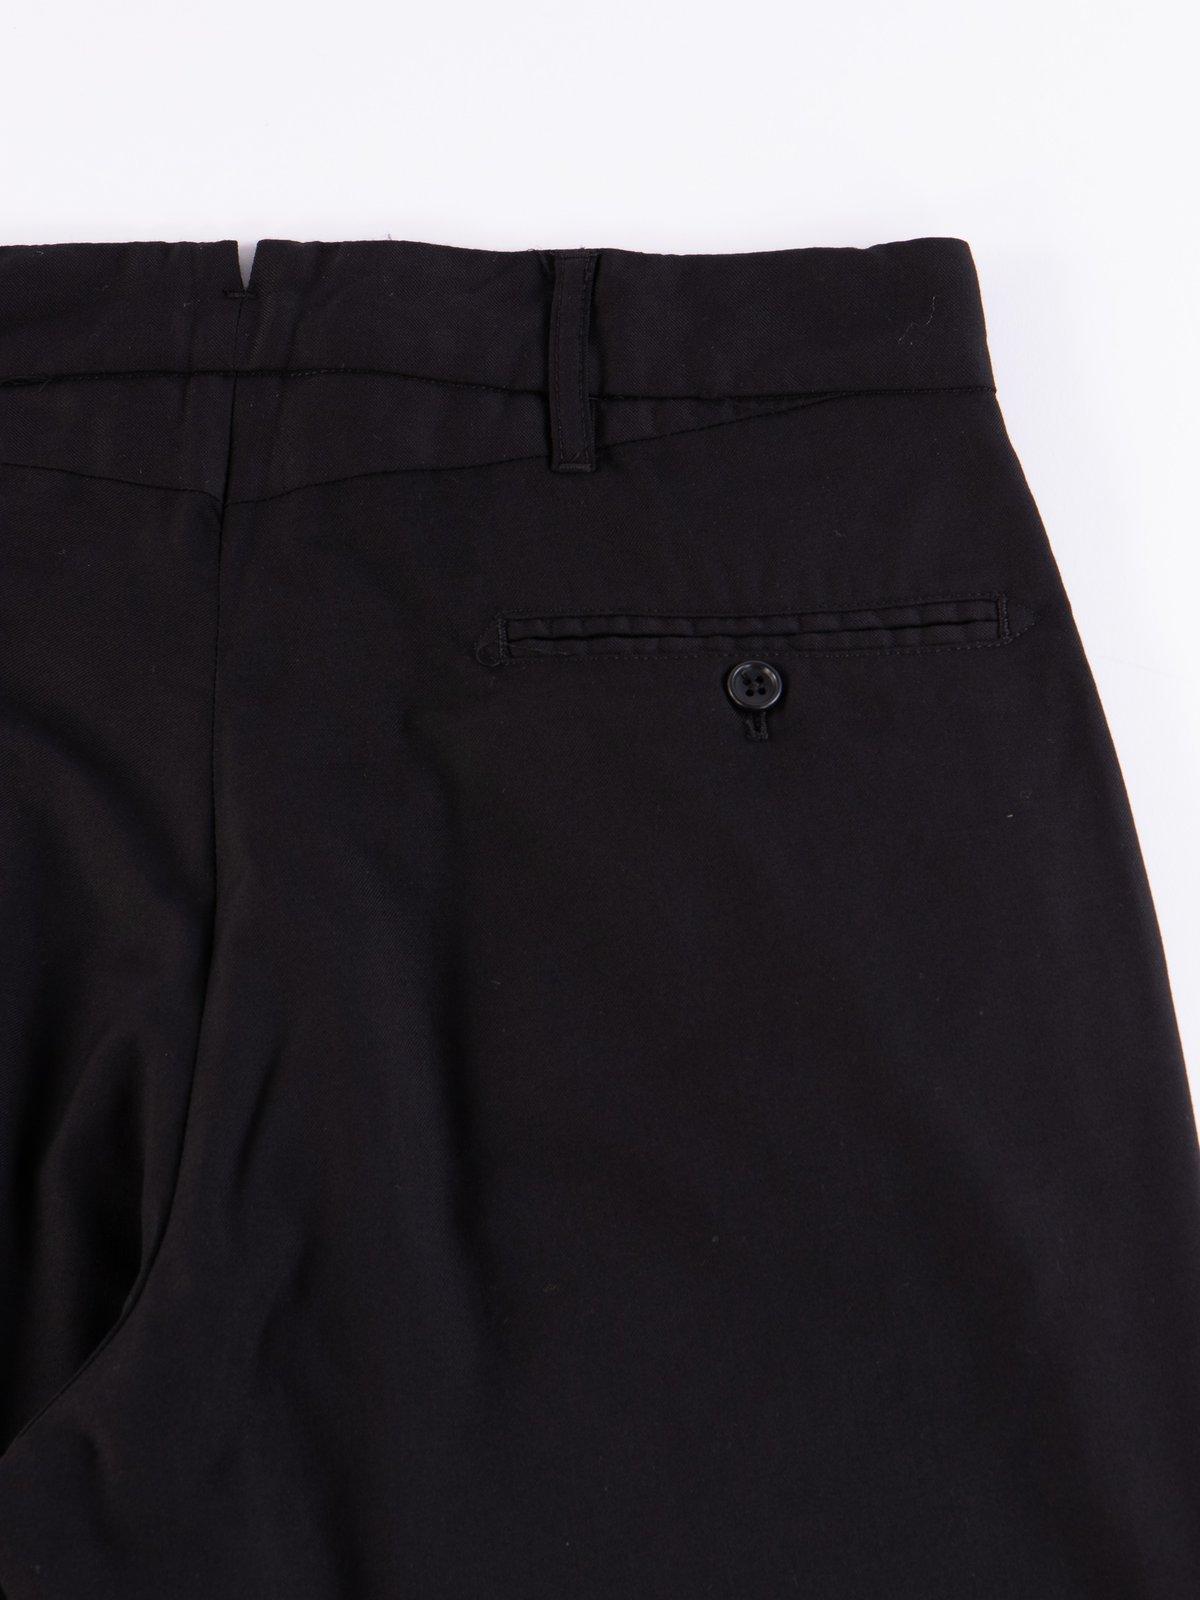 Black Worsted Wool Gabardine Andover Pant - Image 5